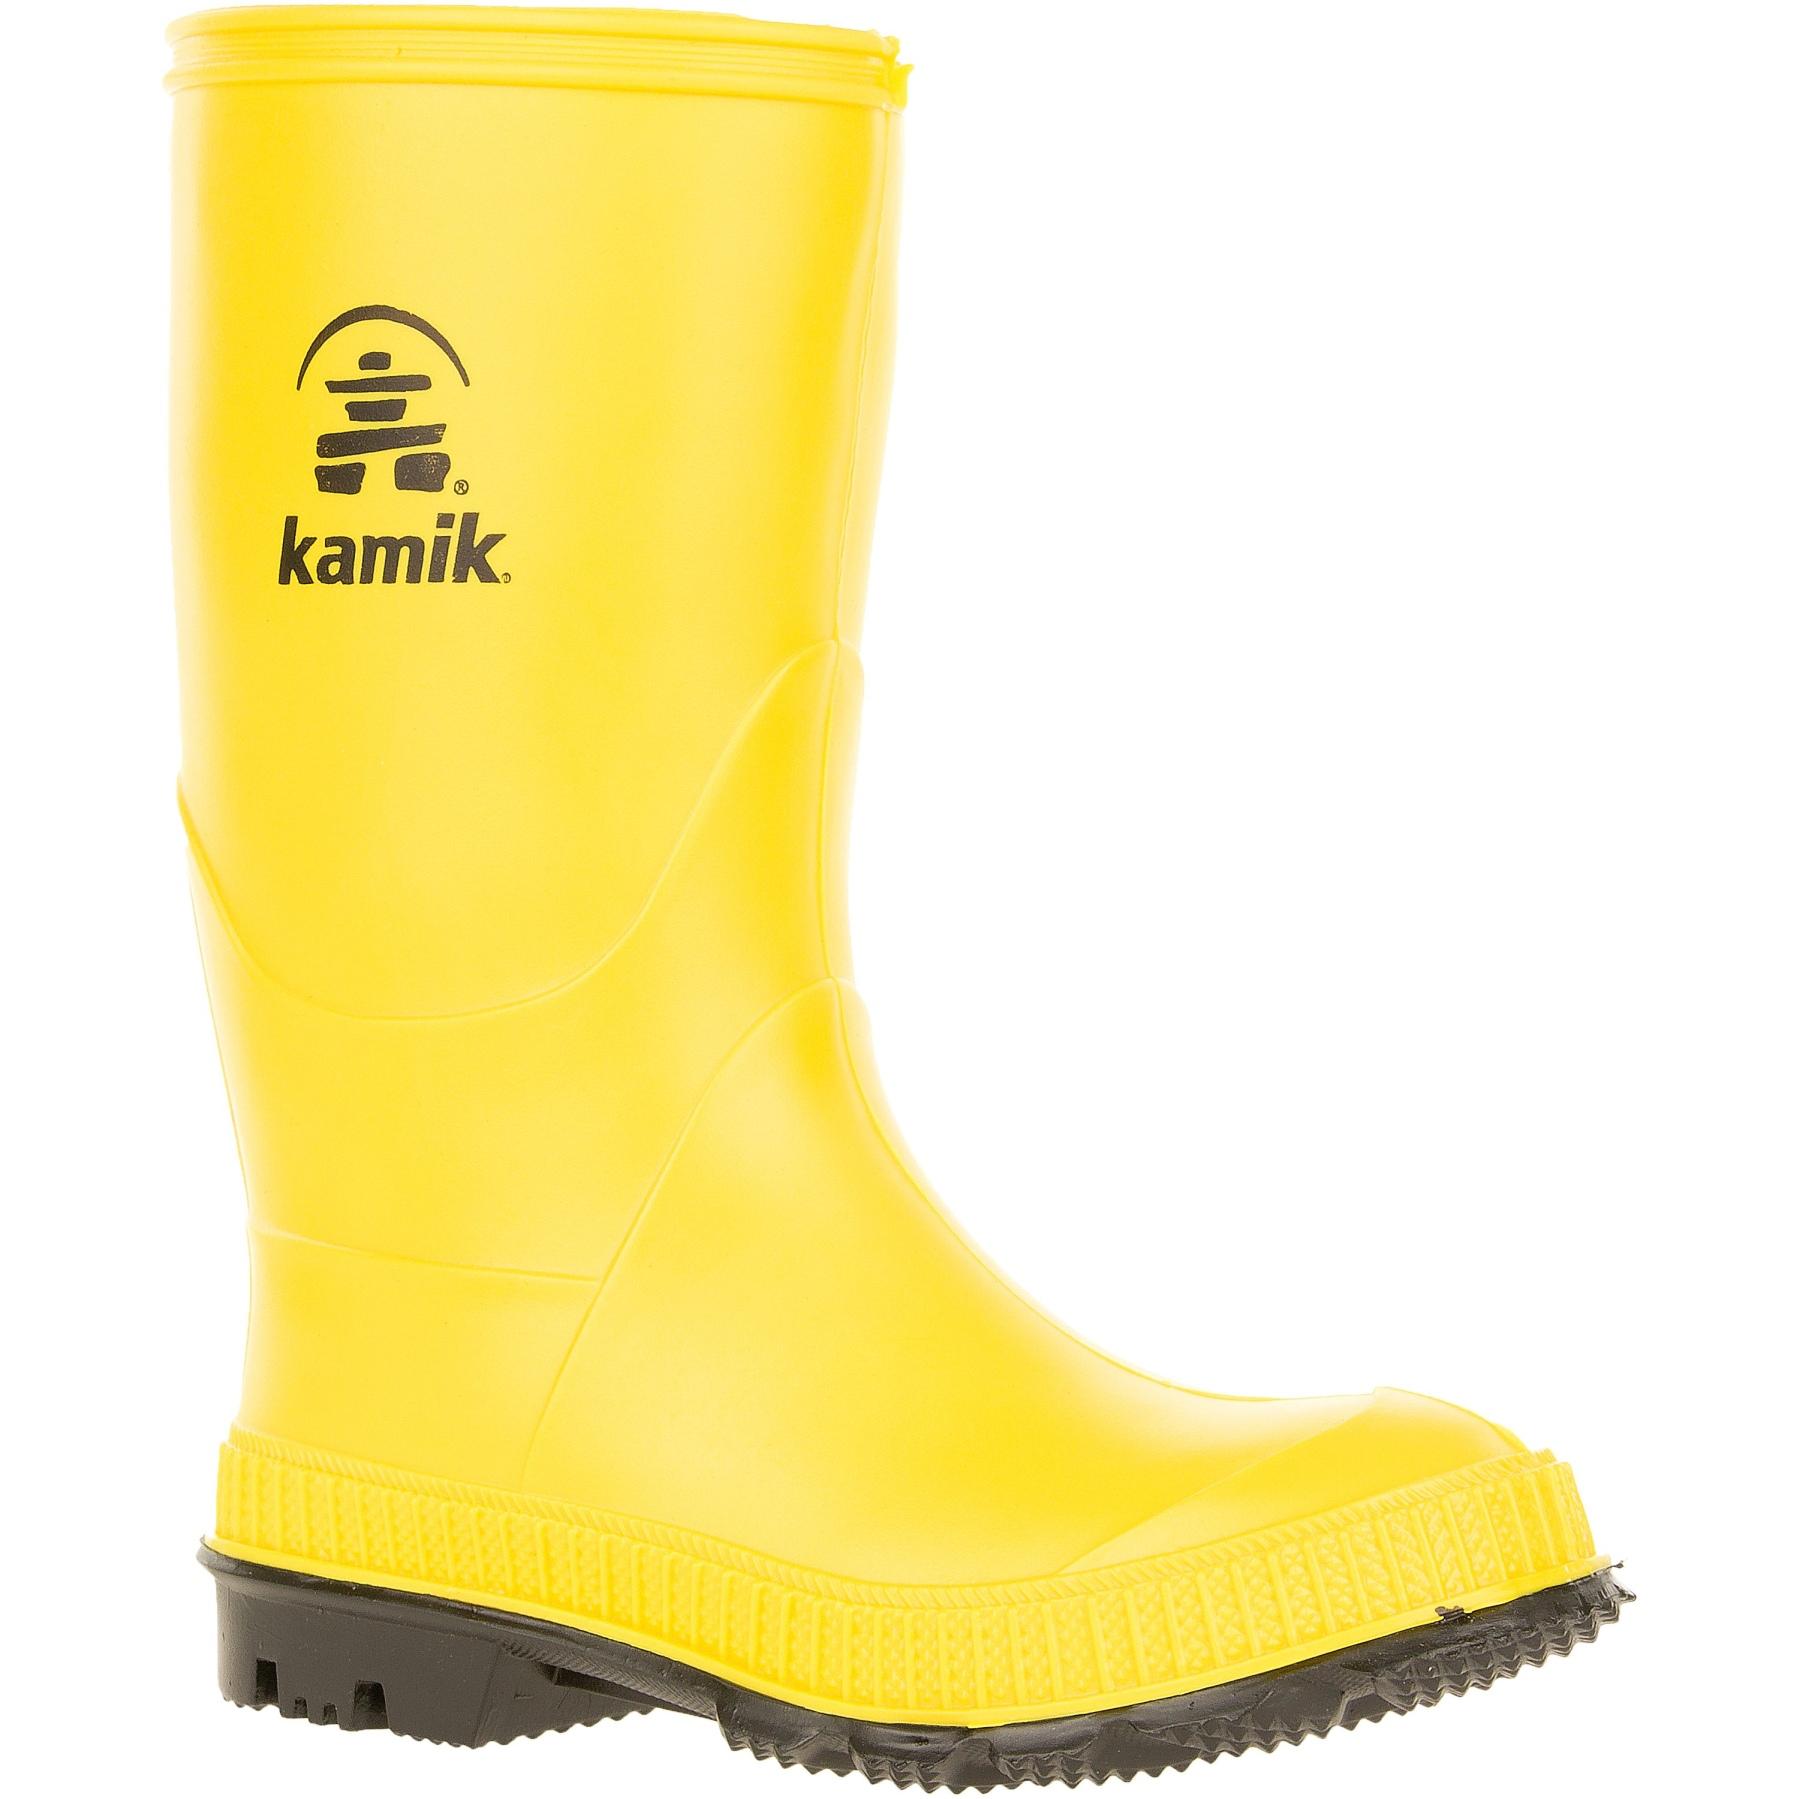 Kamik Stomp Kinder Gummistiefel - Yellow Black